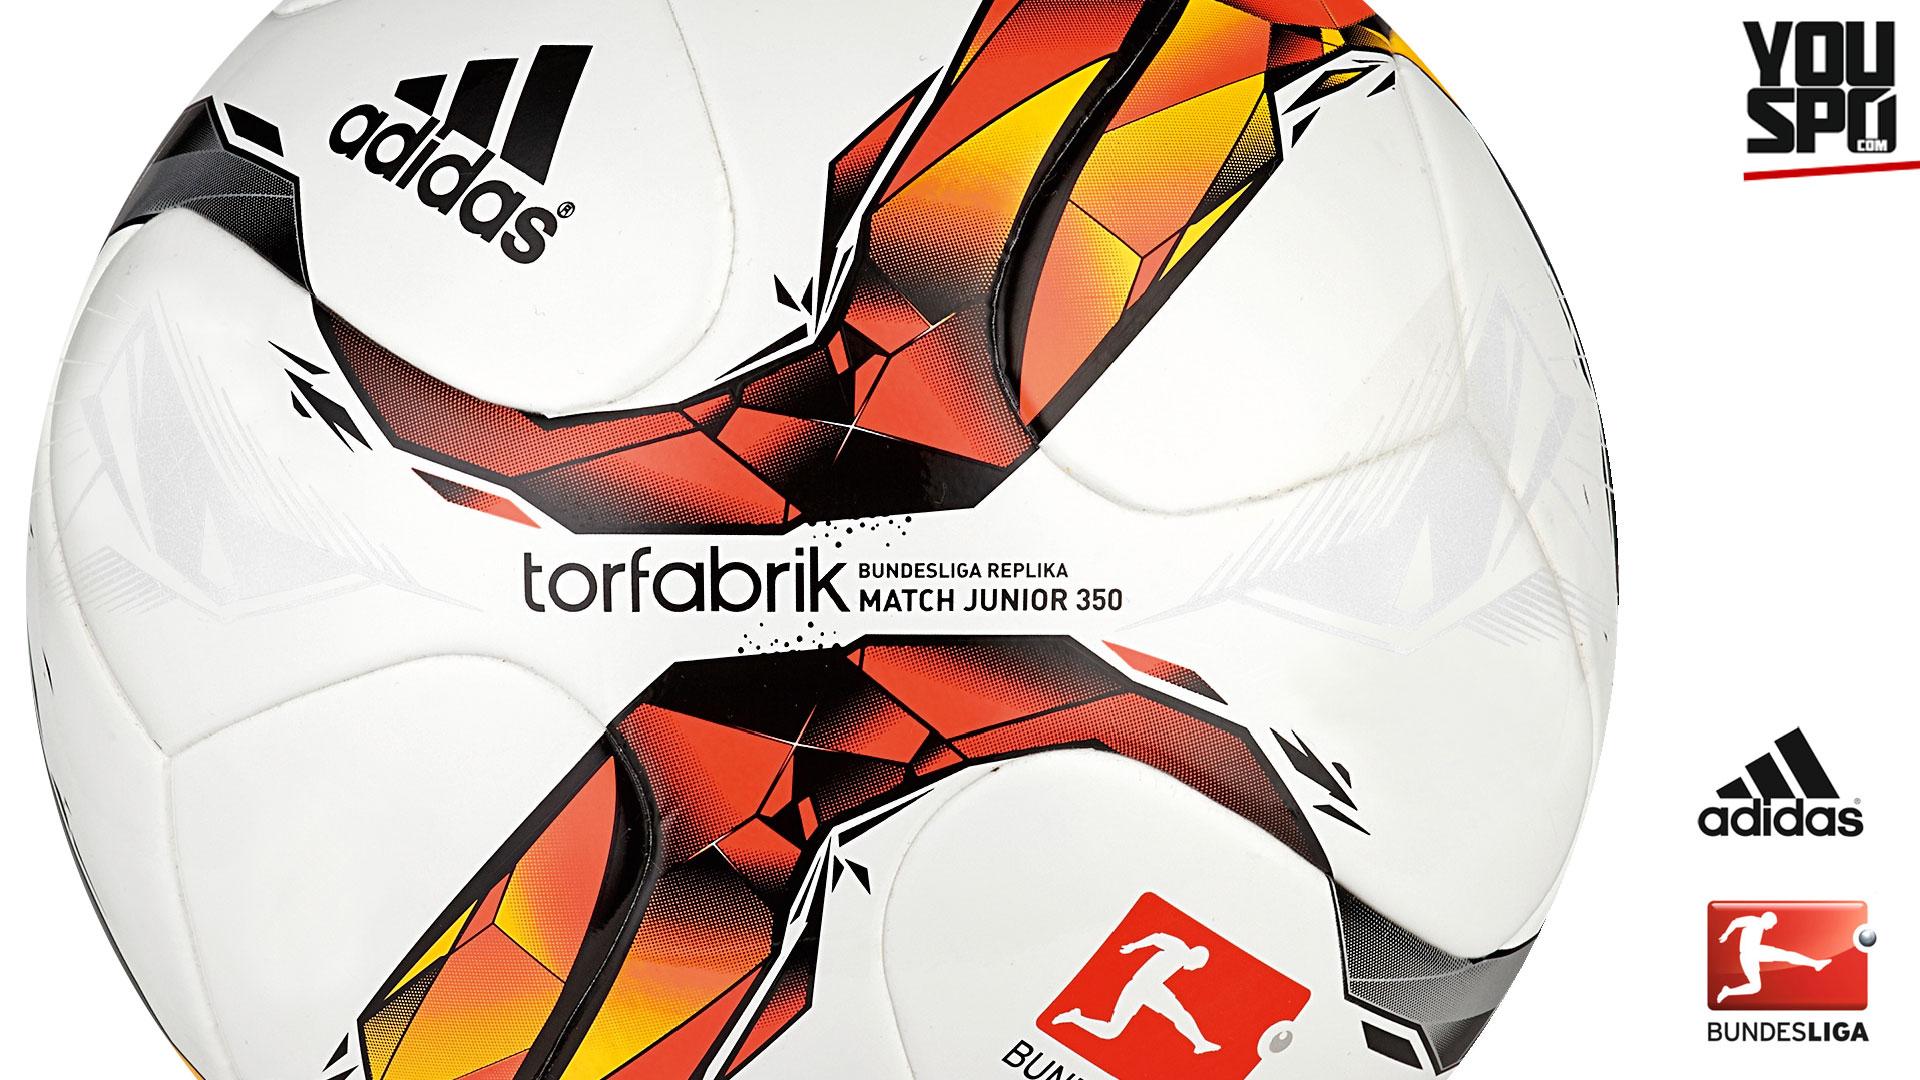 Adidas Torfarbik 15/16 Junior 350 / Junior 290 (2015-2016)